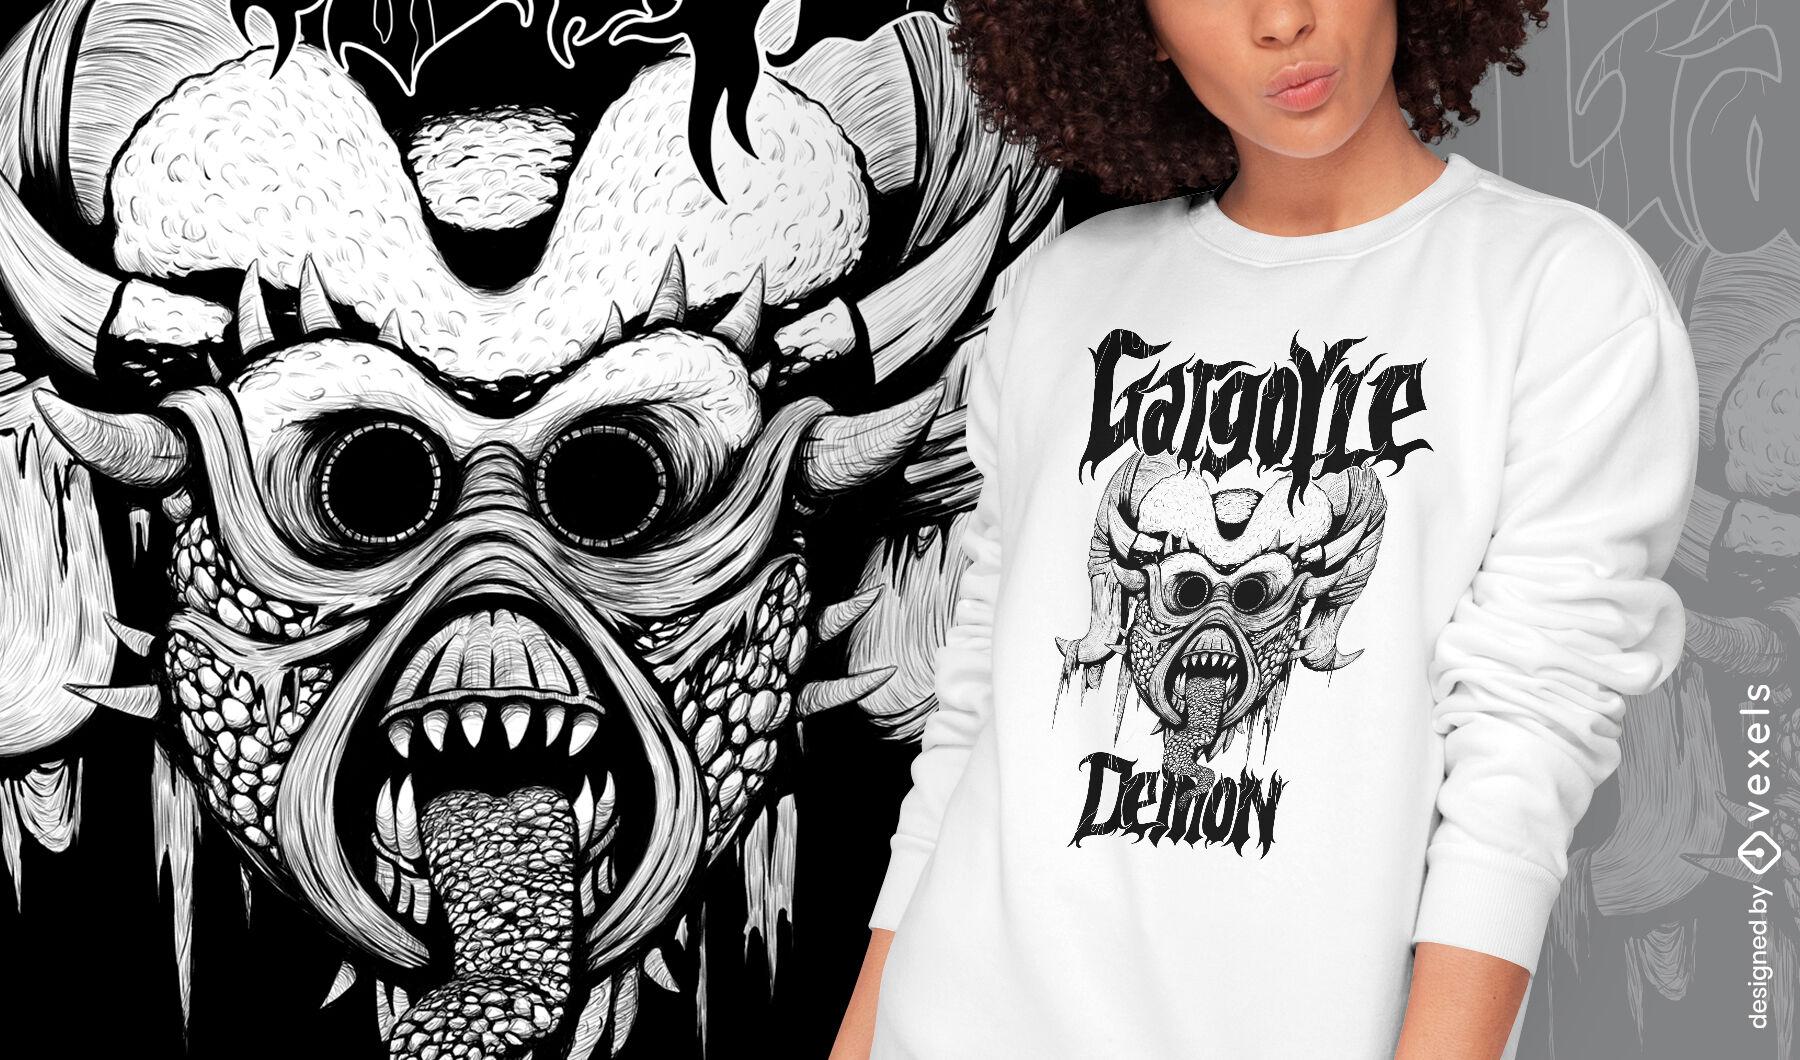 Camiseta dibujada a mano monstruo demonio g?rgola psd